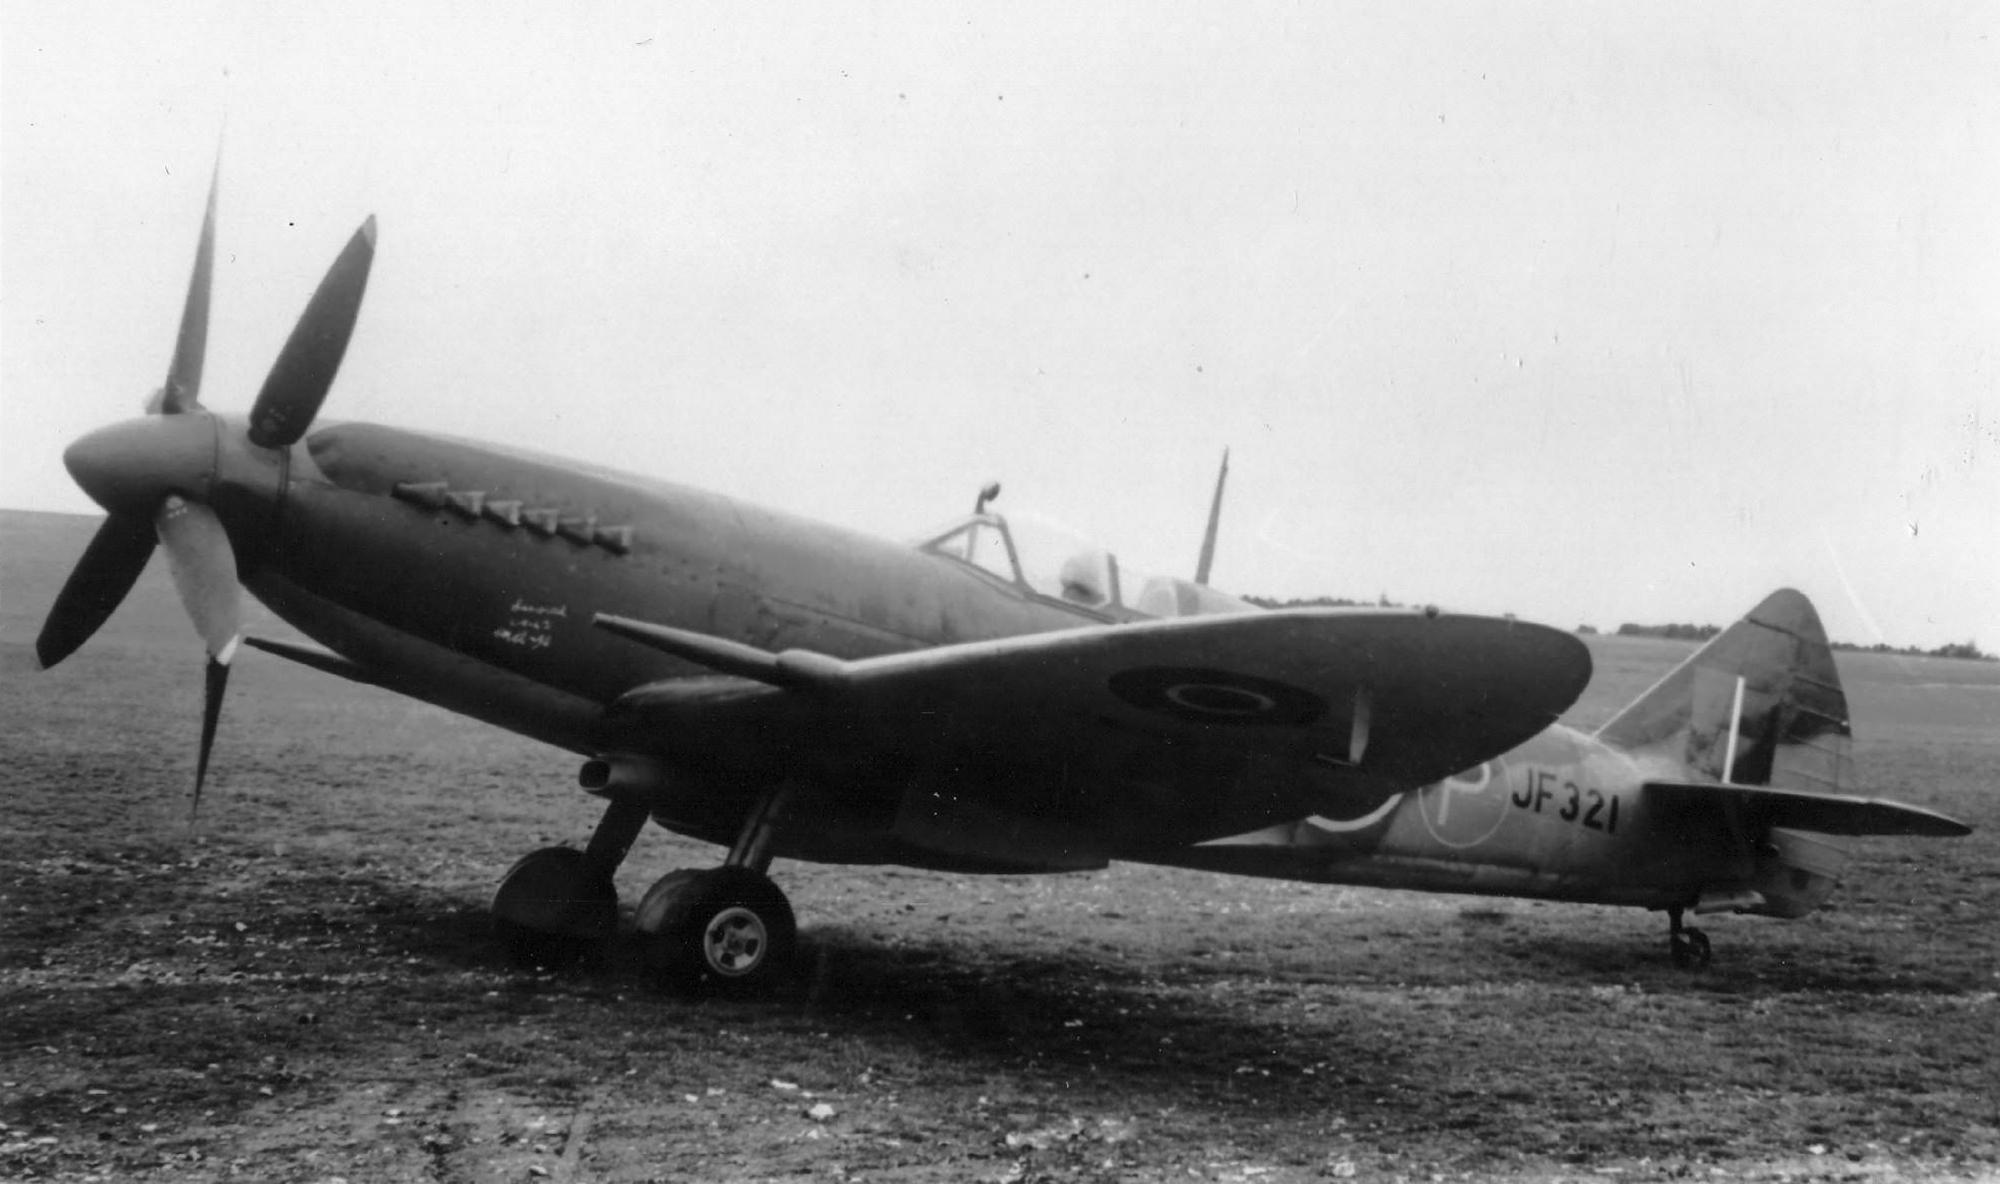 Spitfire 14 Prototype JF321 on the ground England web 01